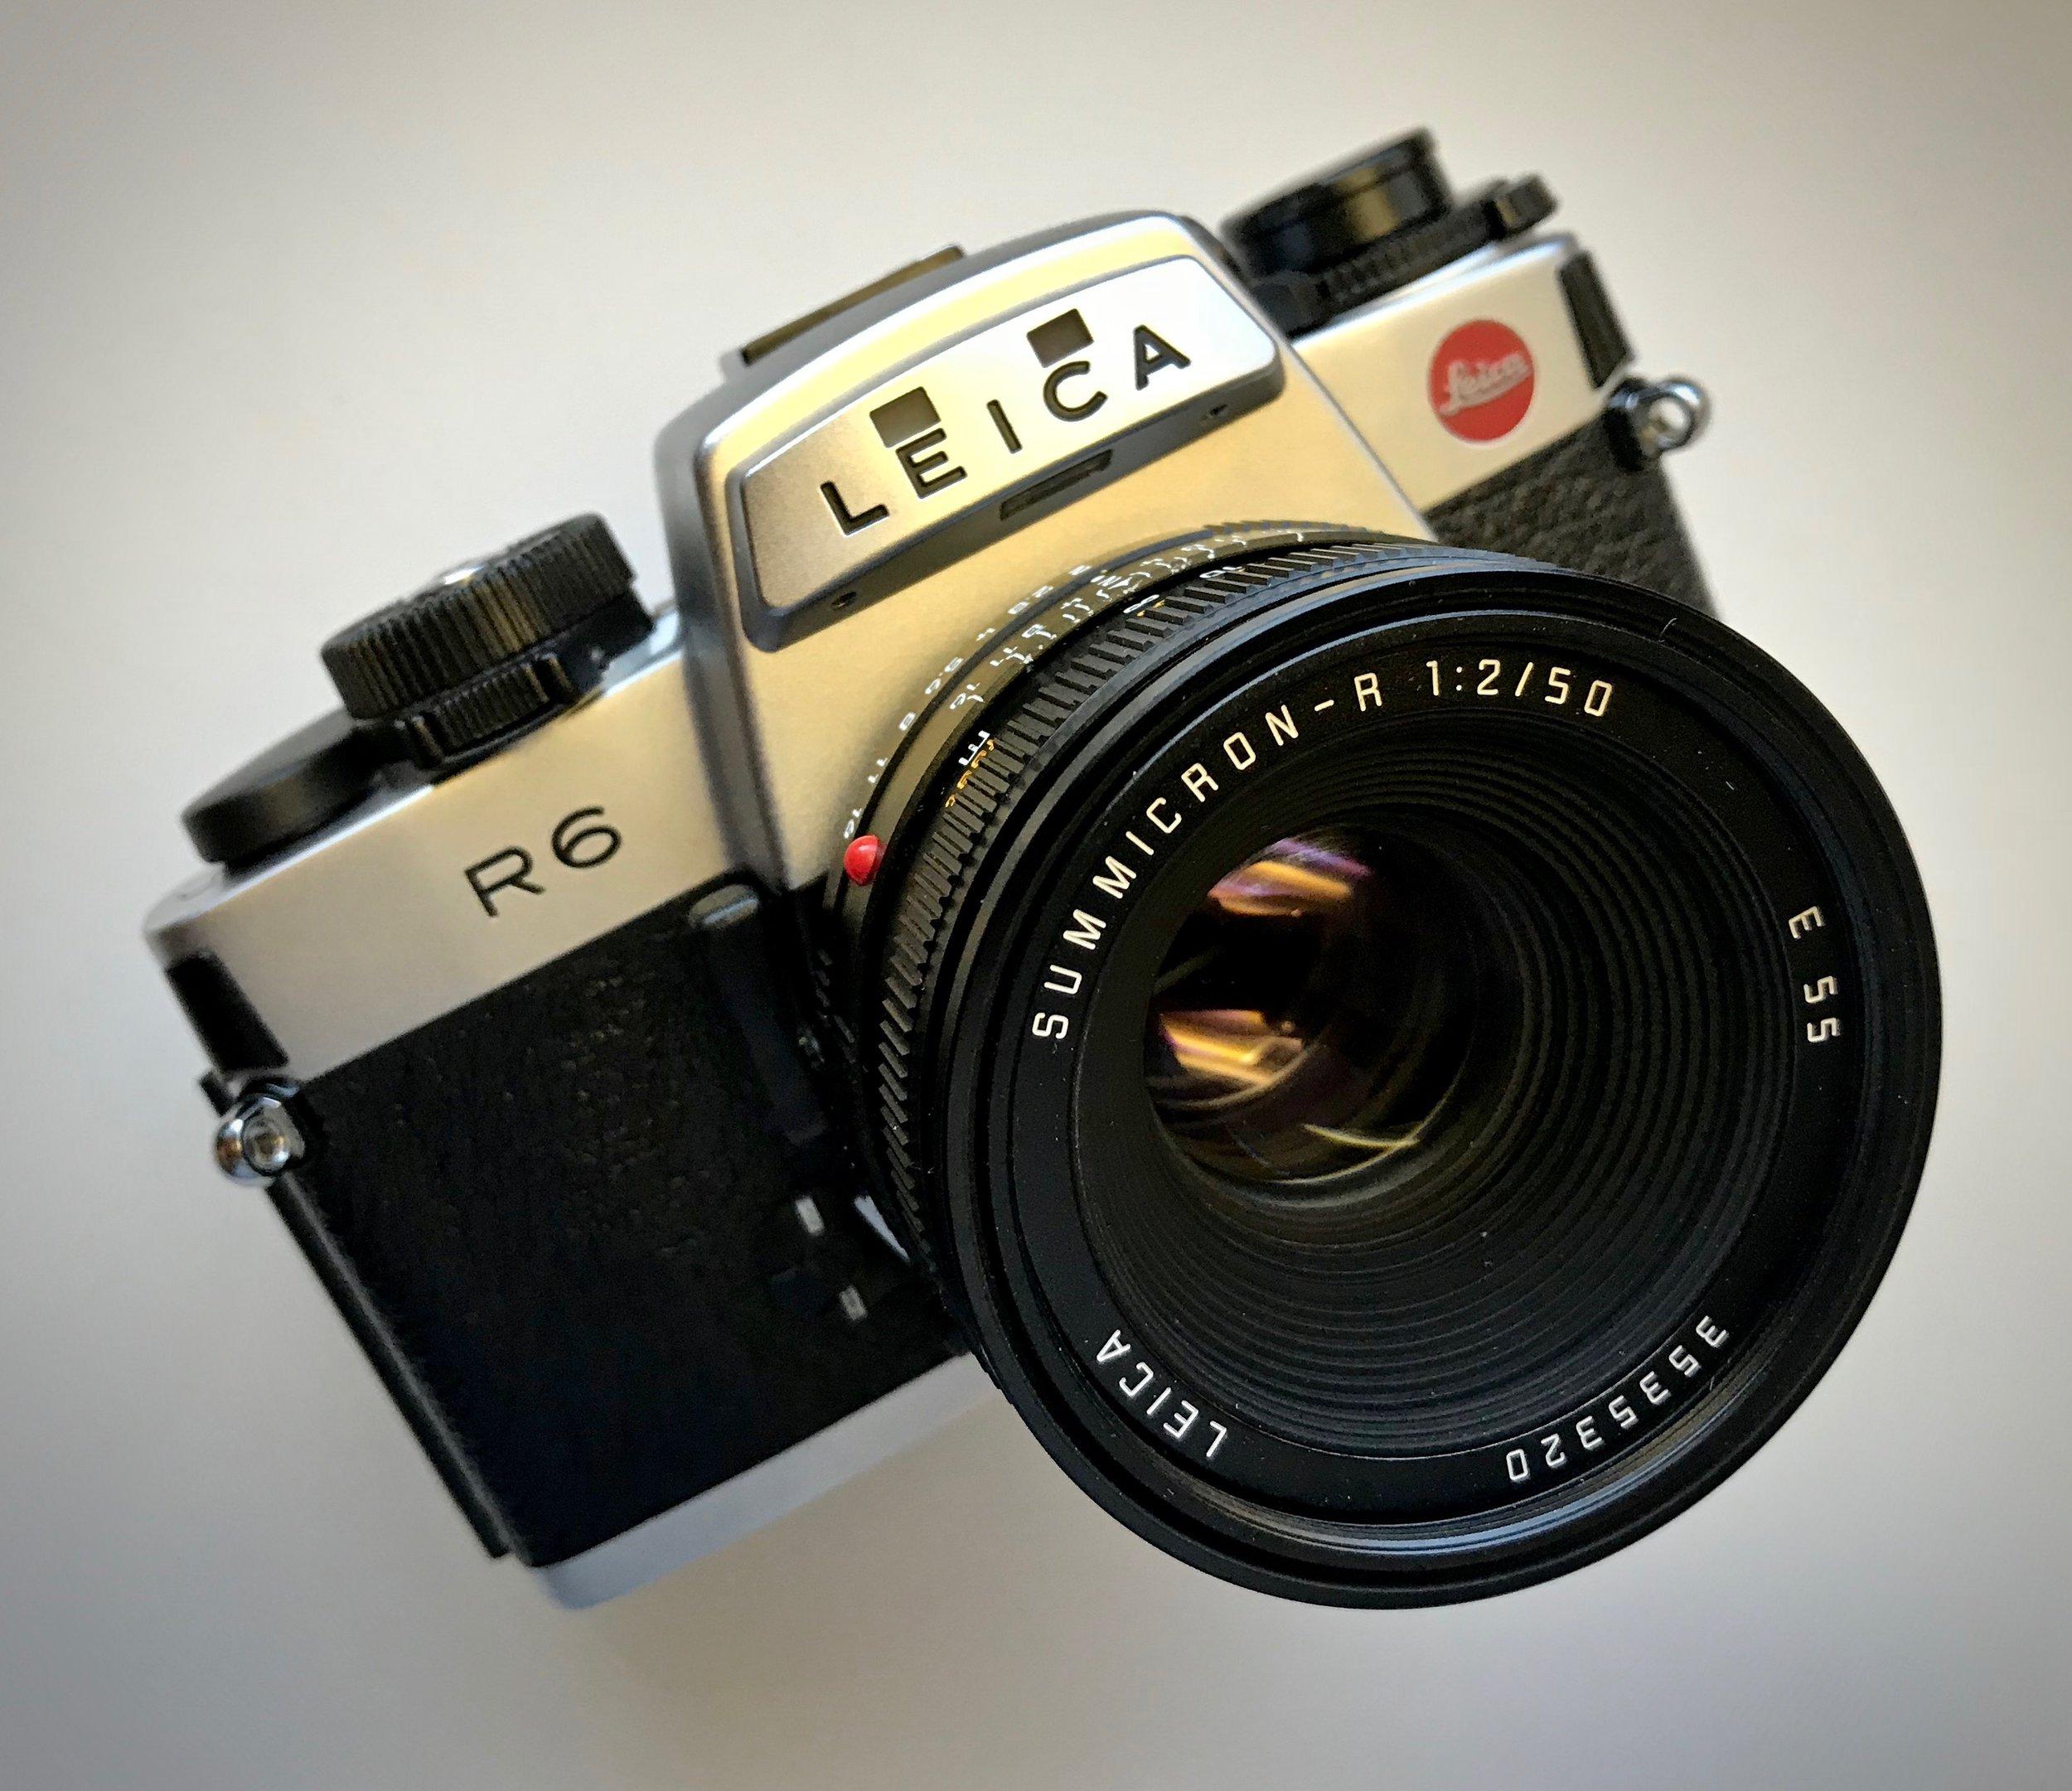 Leica R6 Chrome with 50mm f/2 Summicron